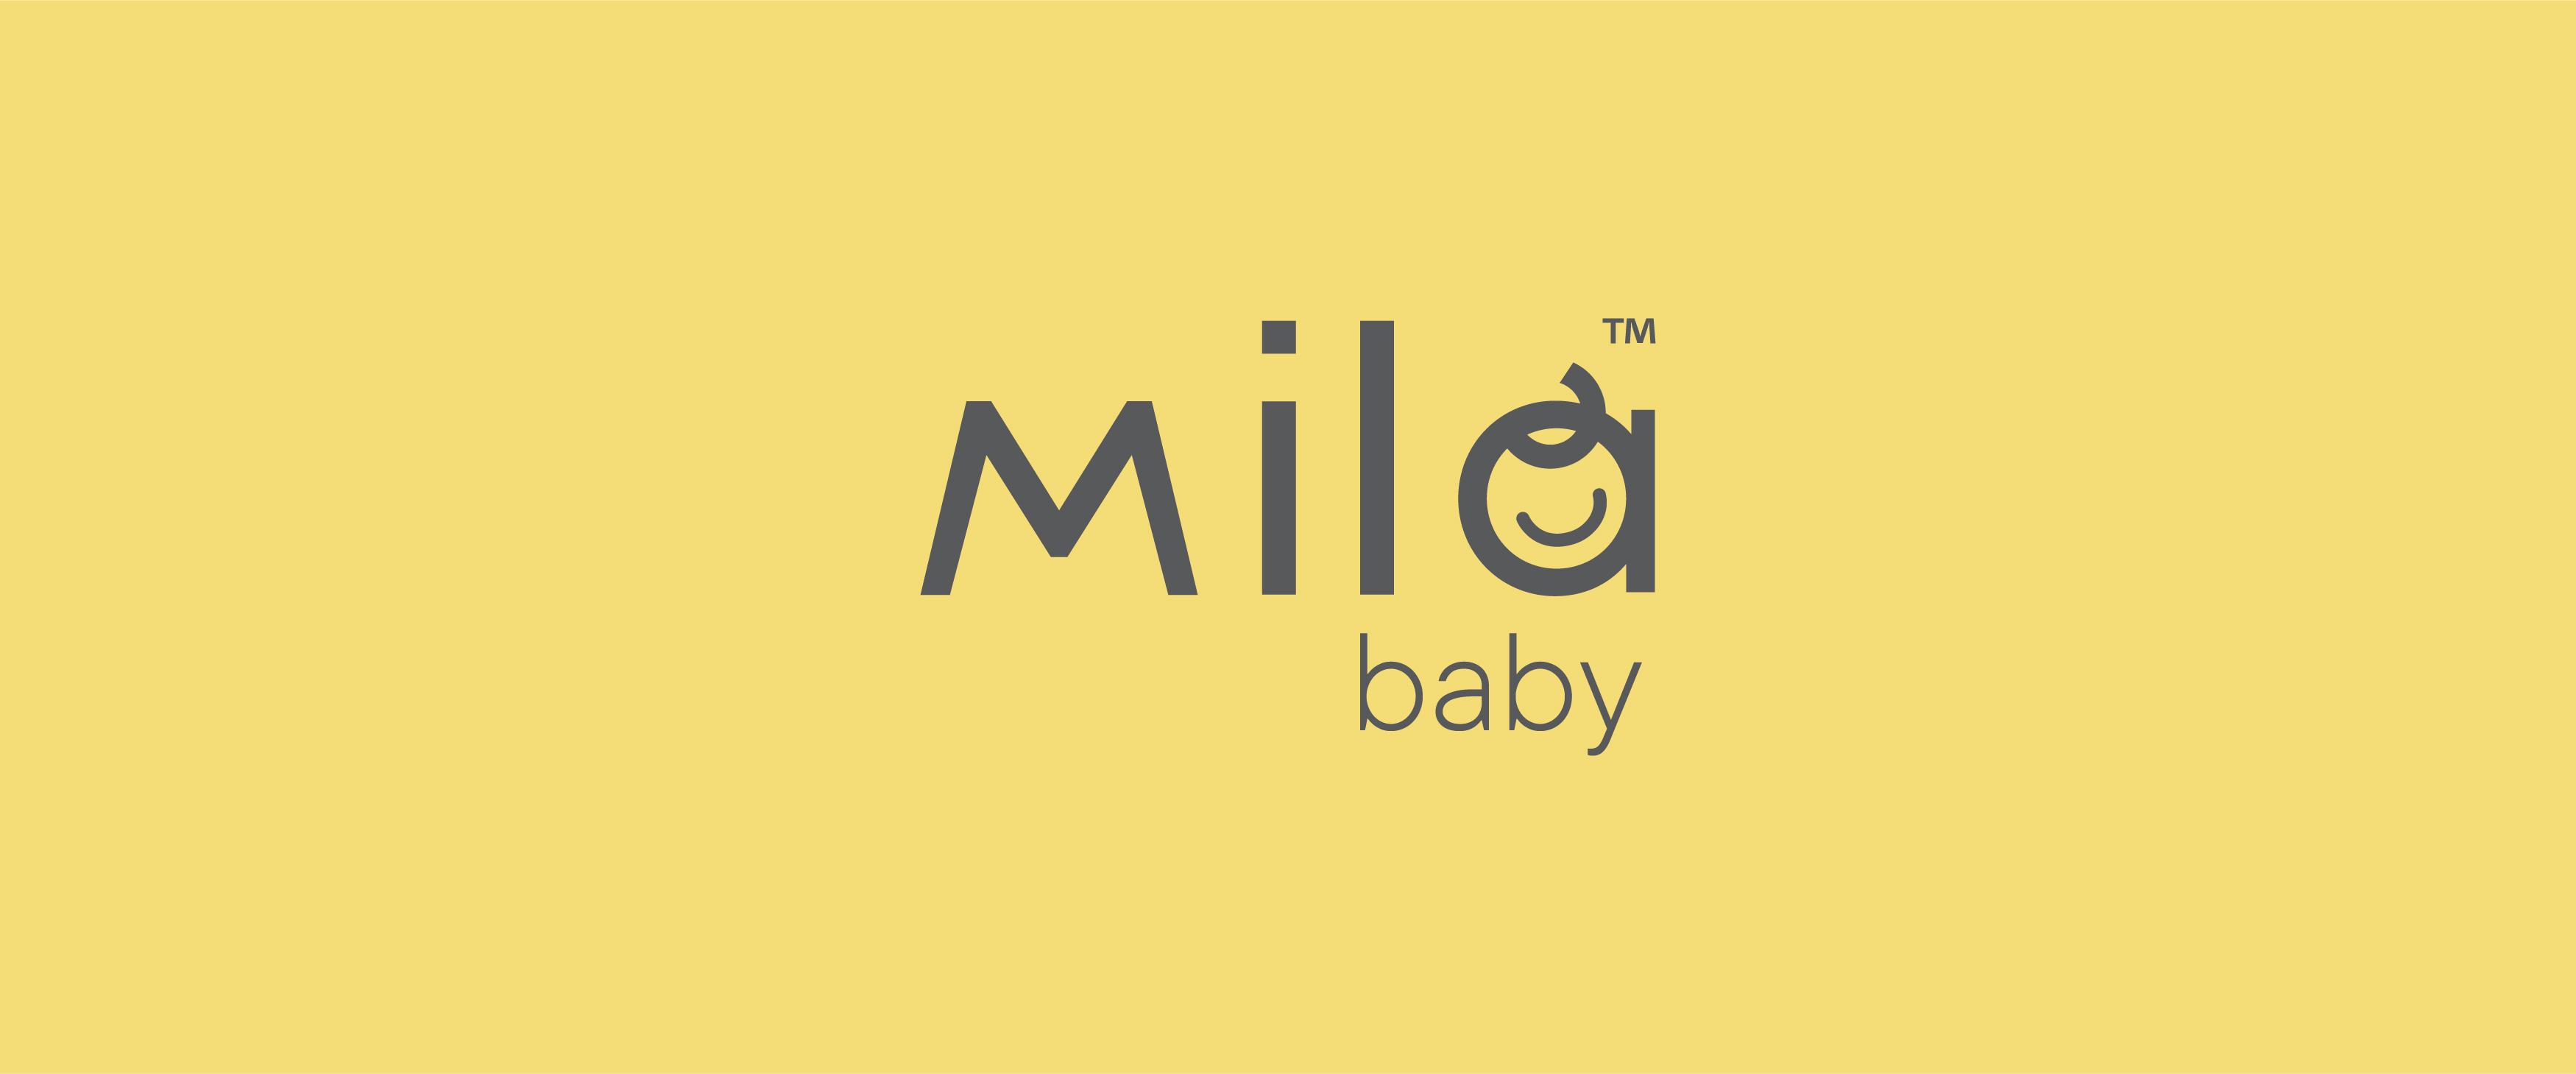 mila-flow-01